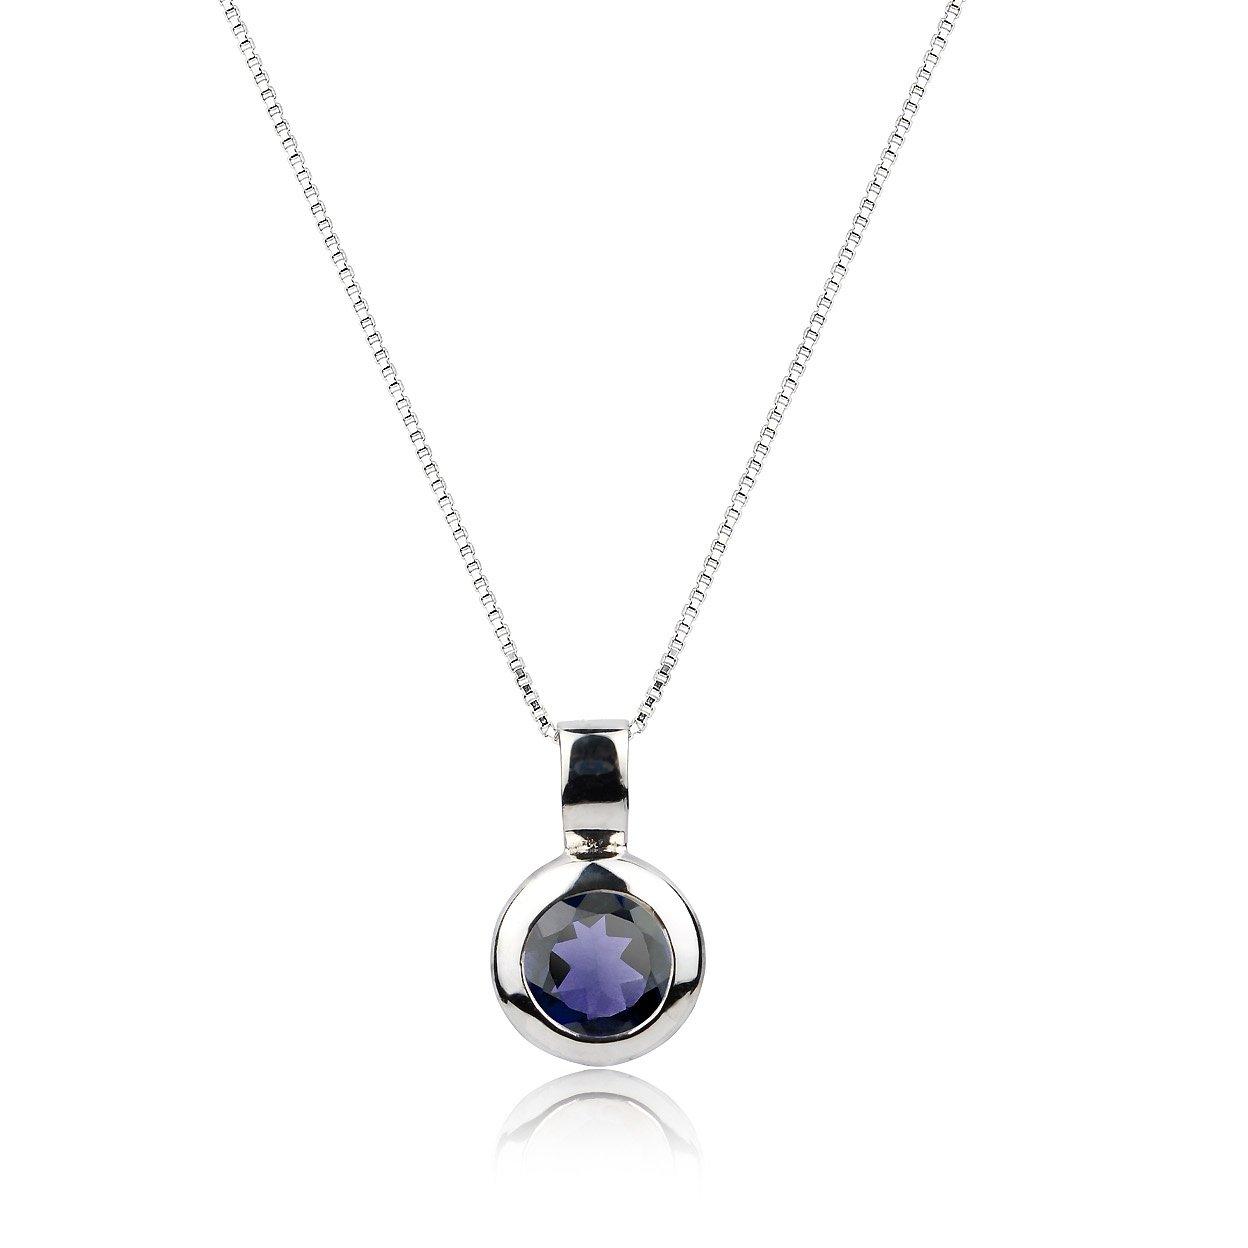 Round Iolite Bezel Set Pendant Necklace